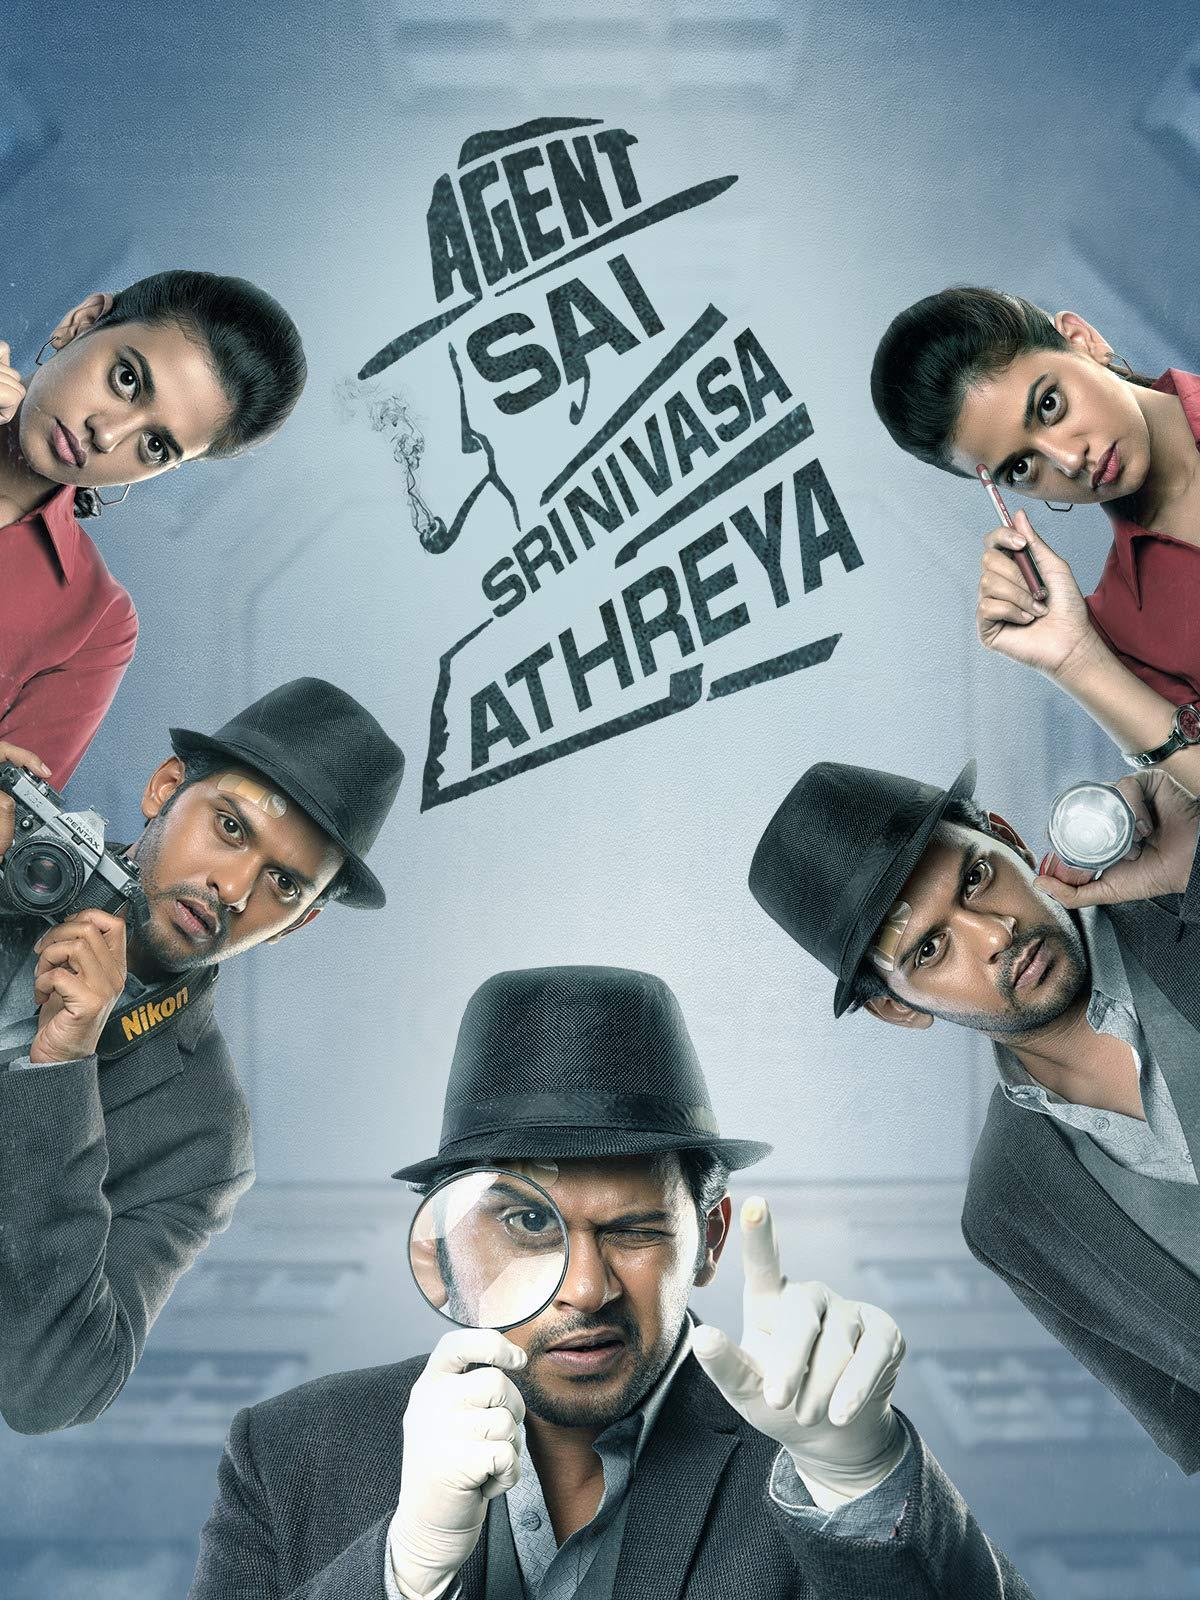 Agent Sai Srinivasa Athreya 2019 UNCUT 720p HEVC HDRip South Movie [Dual Audio] [Hindi or Telugu] x265 AAC ESubs [800MB]